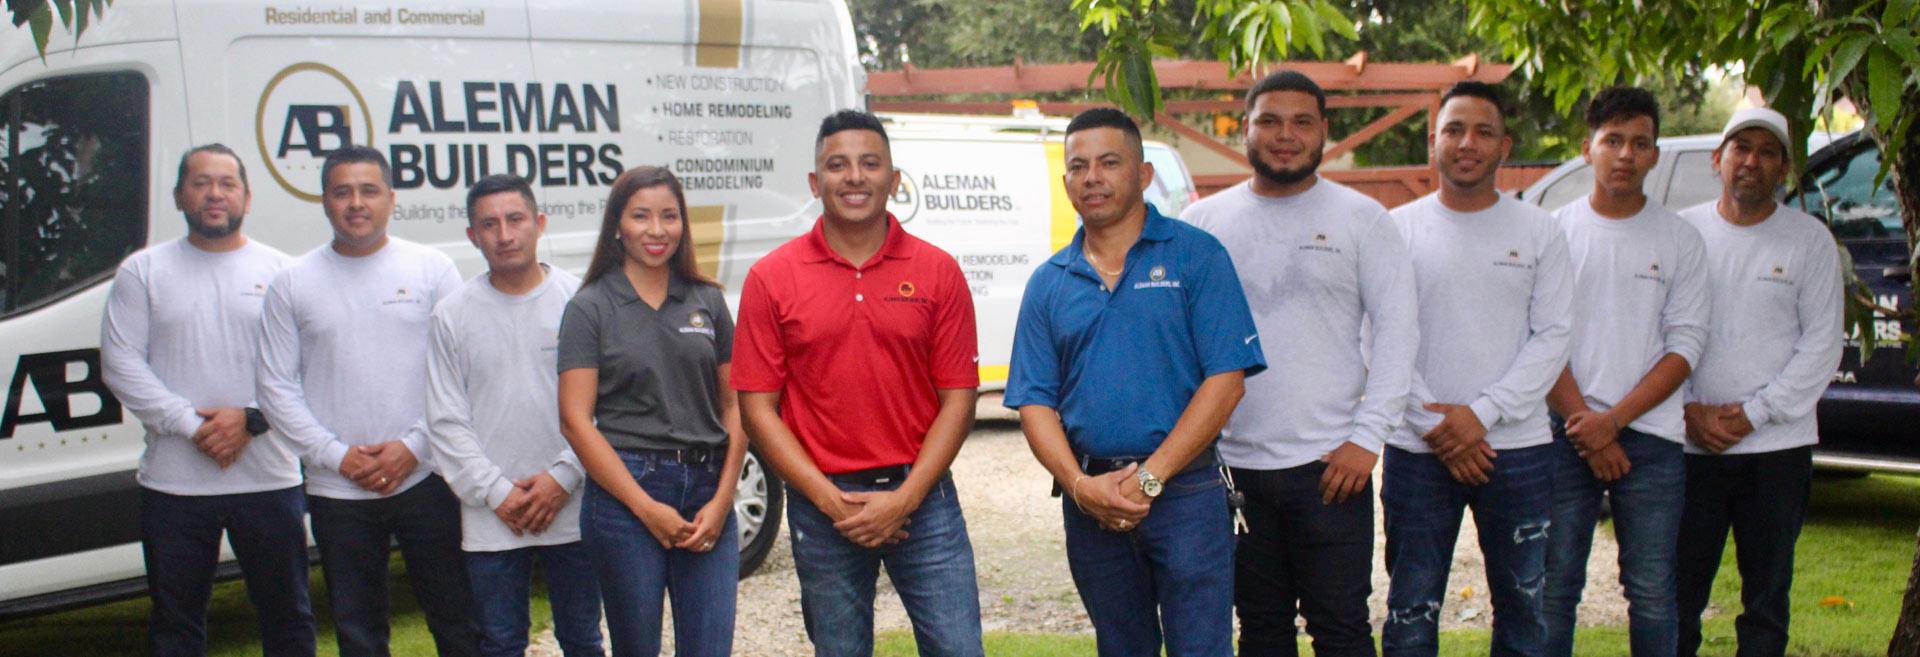 Aleman Builders Team | Naples, Florida Builders